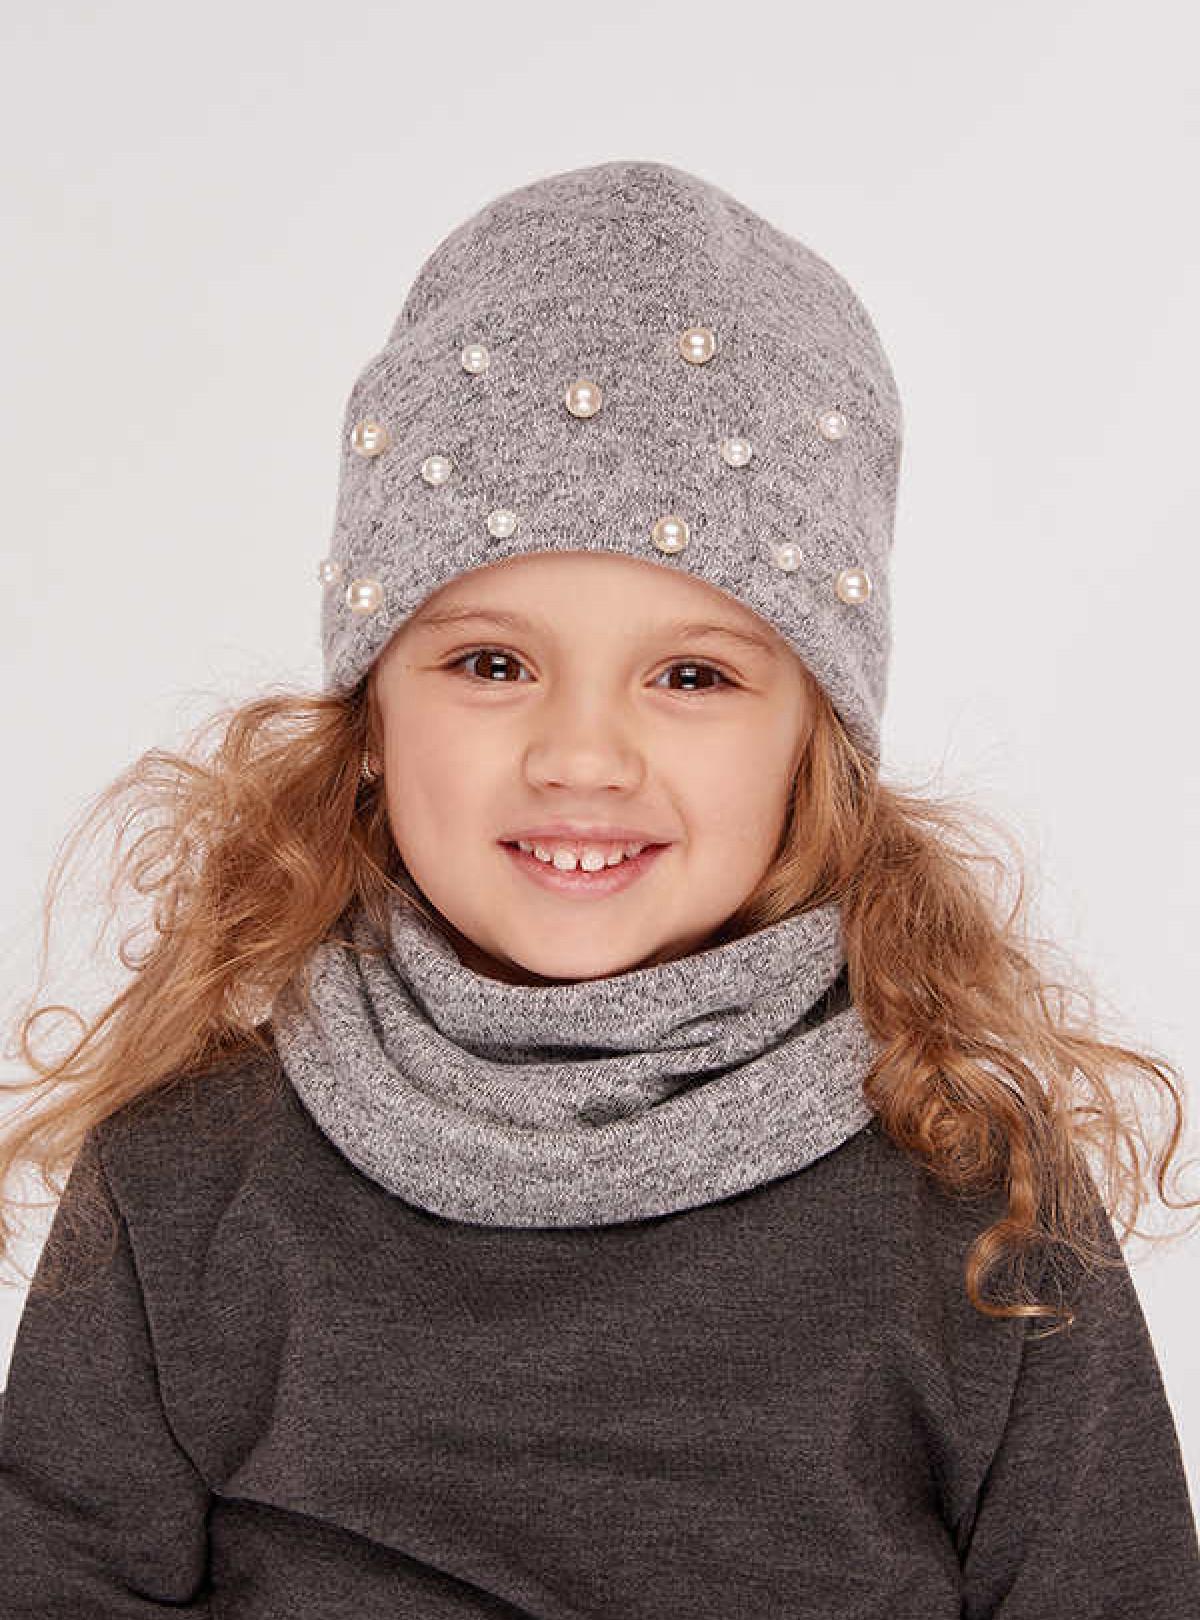 Осенняя шапка Сандал (набор) серый Dembohouse   761